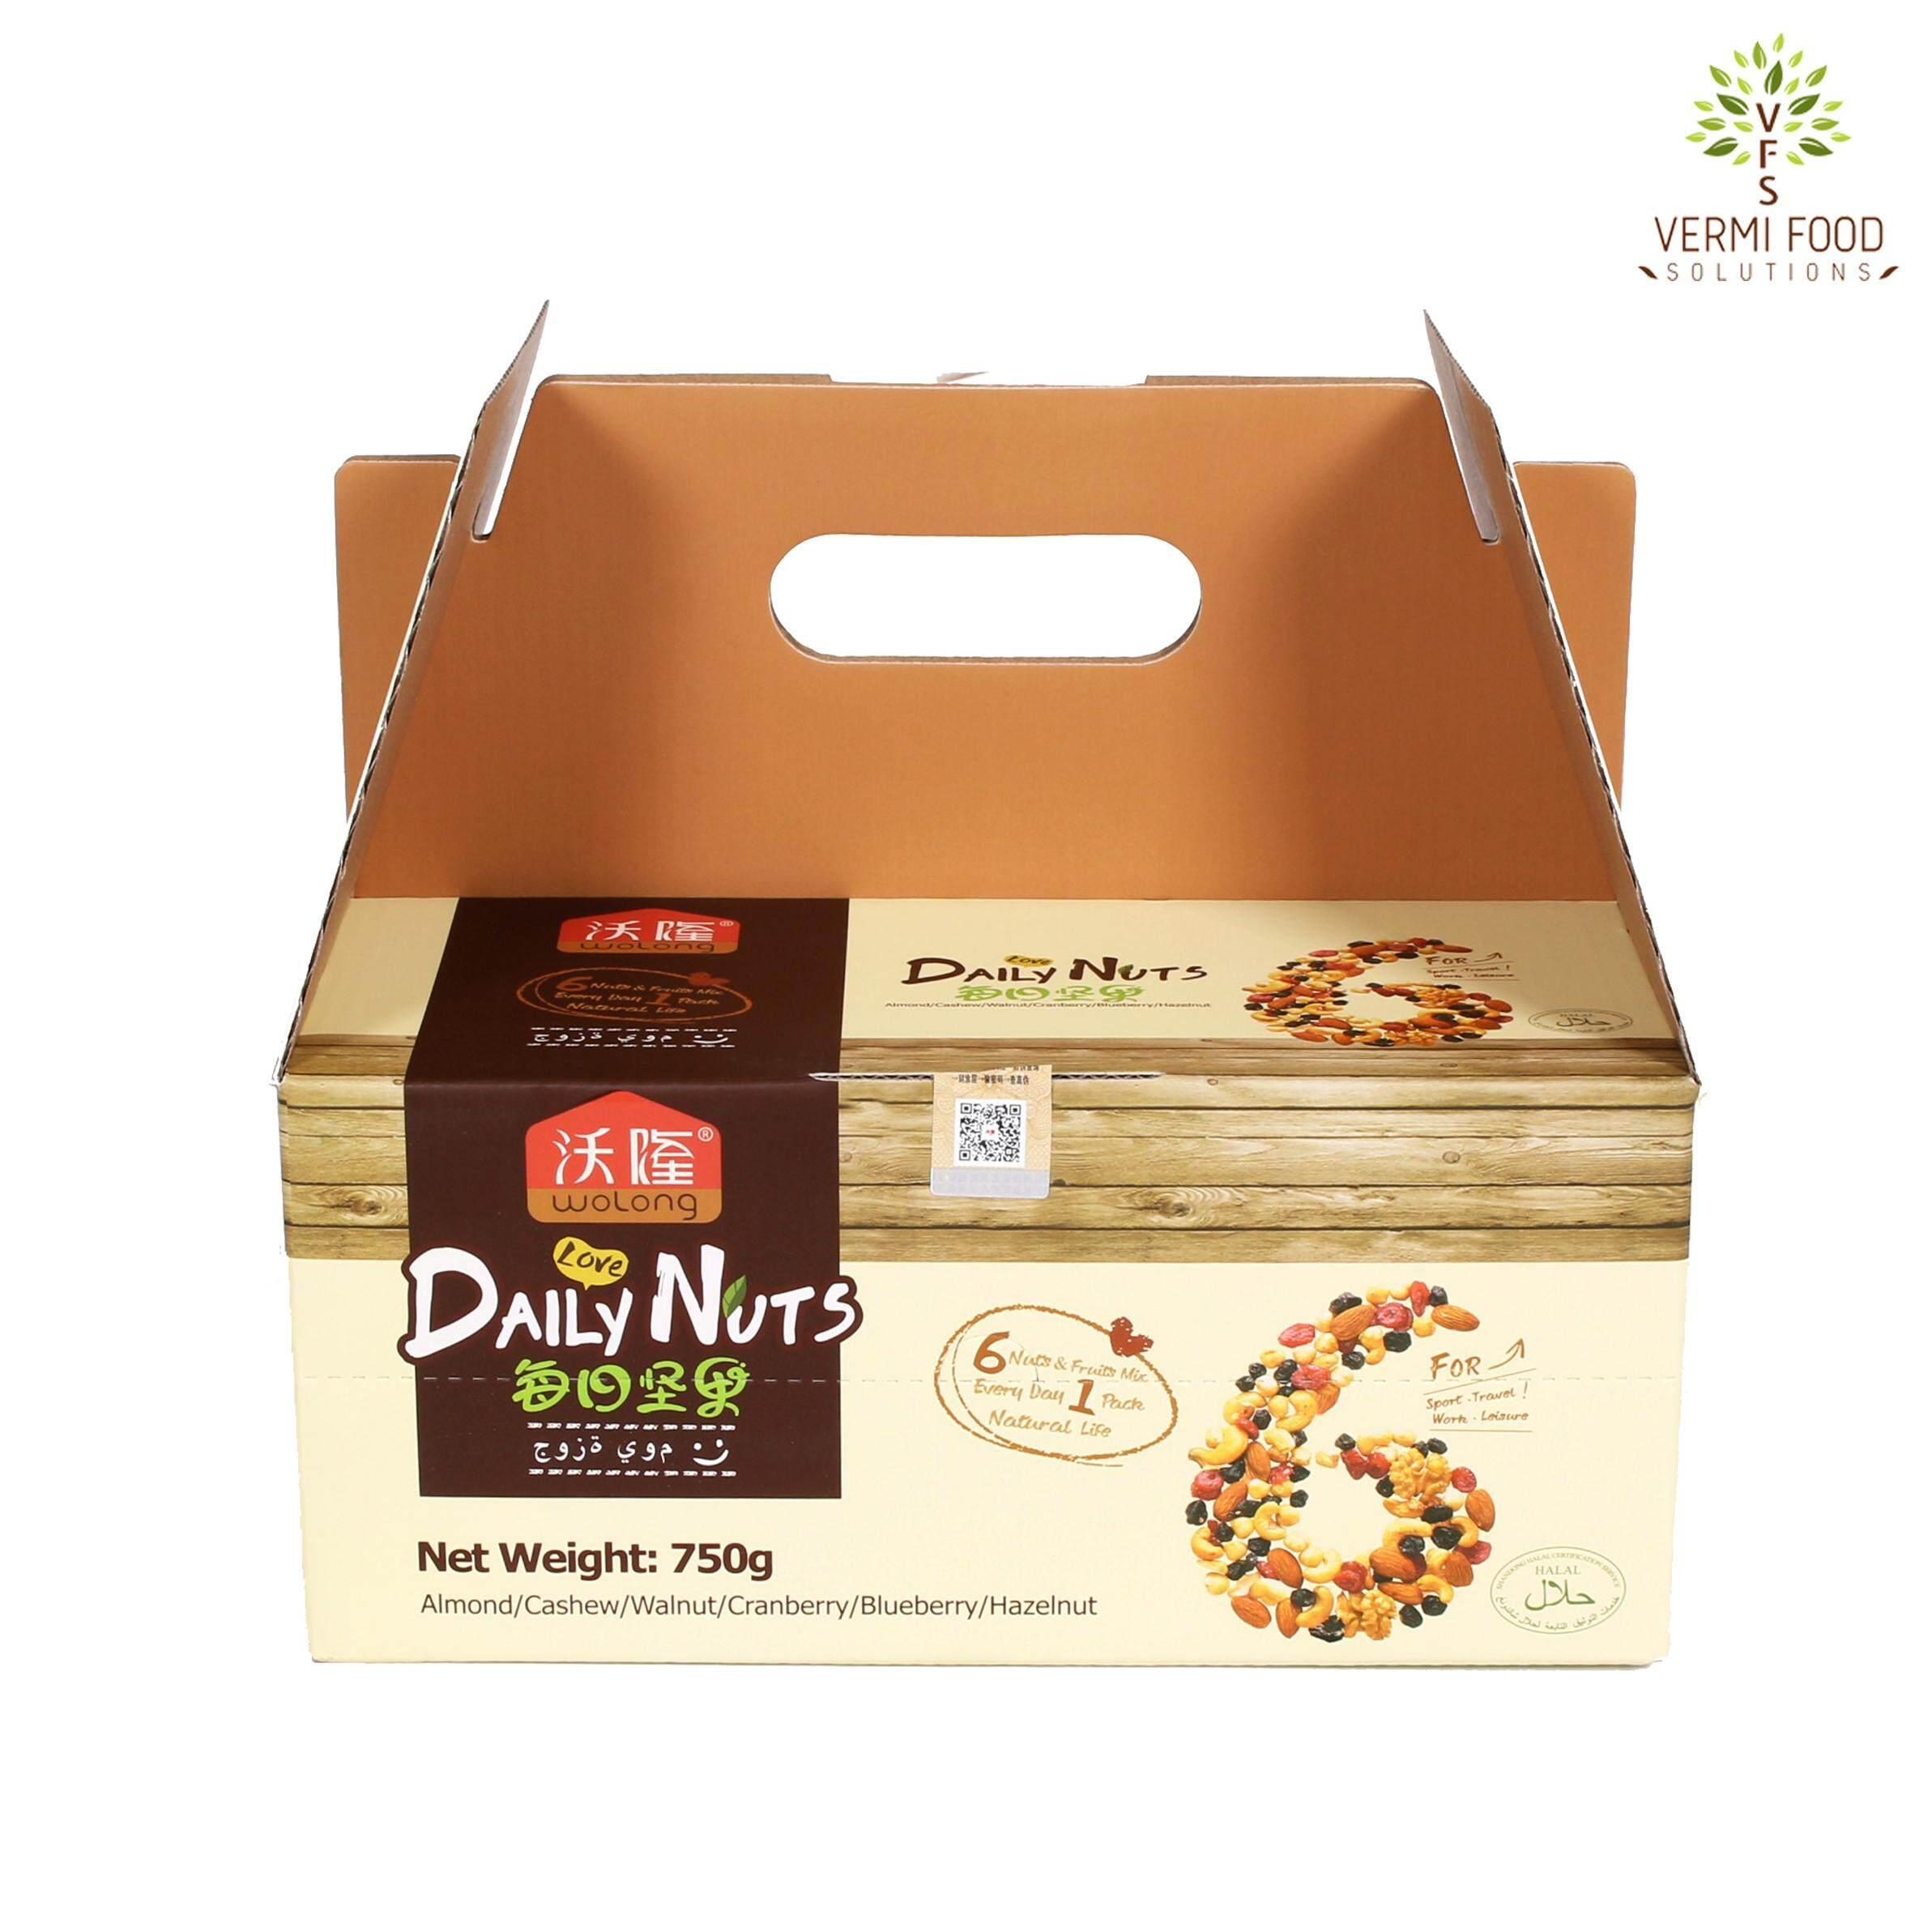 Wolong Daily Nuts A 750g (25g x 30 packs) (Cranberry, Blueberry, Almond, Cashew, Hazelnuts, Walnuts)